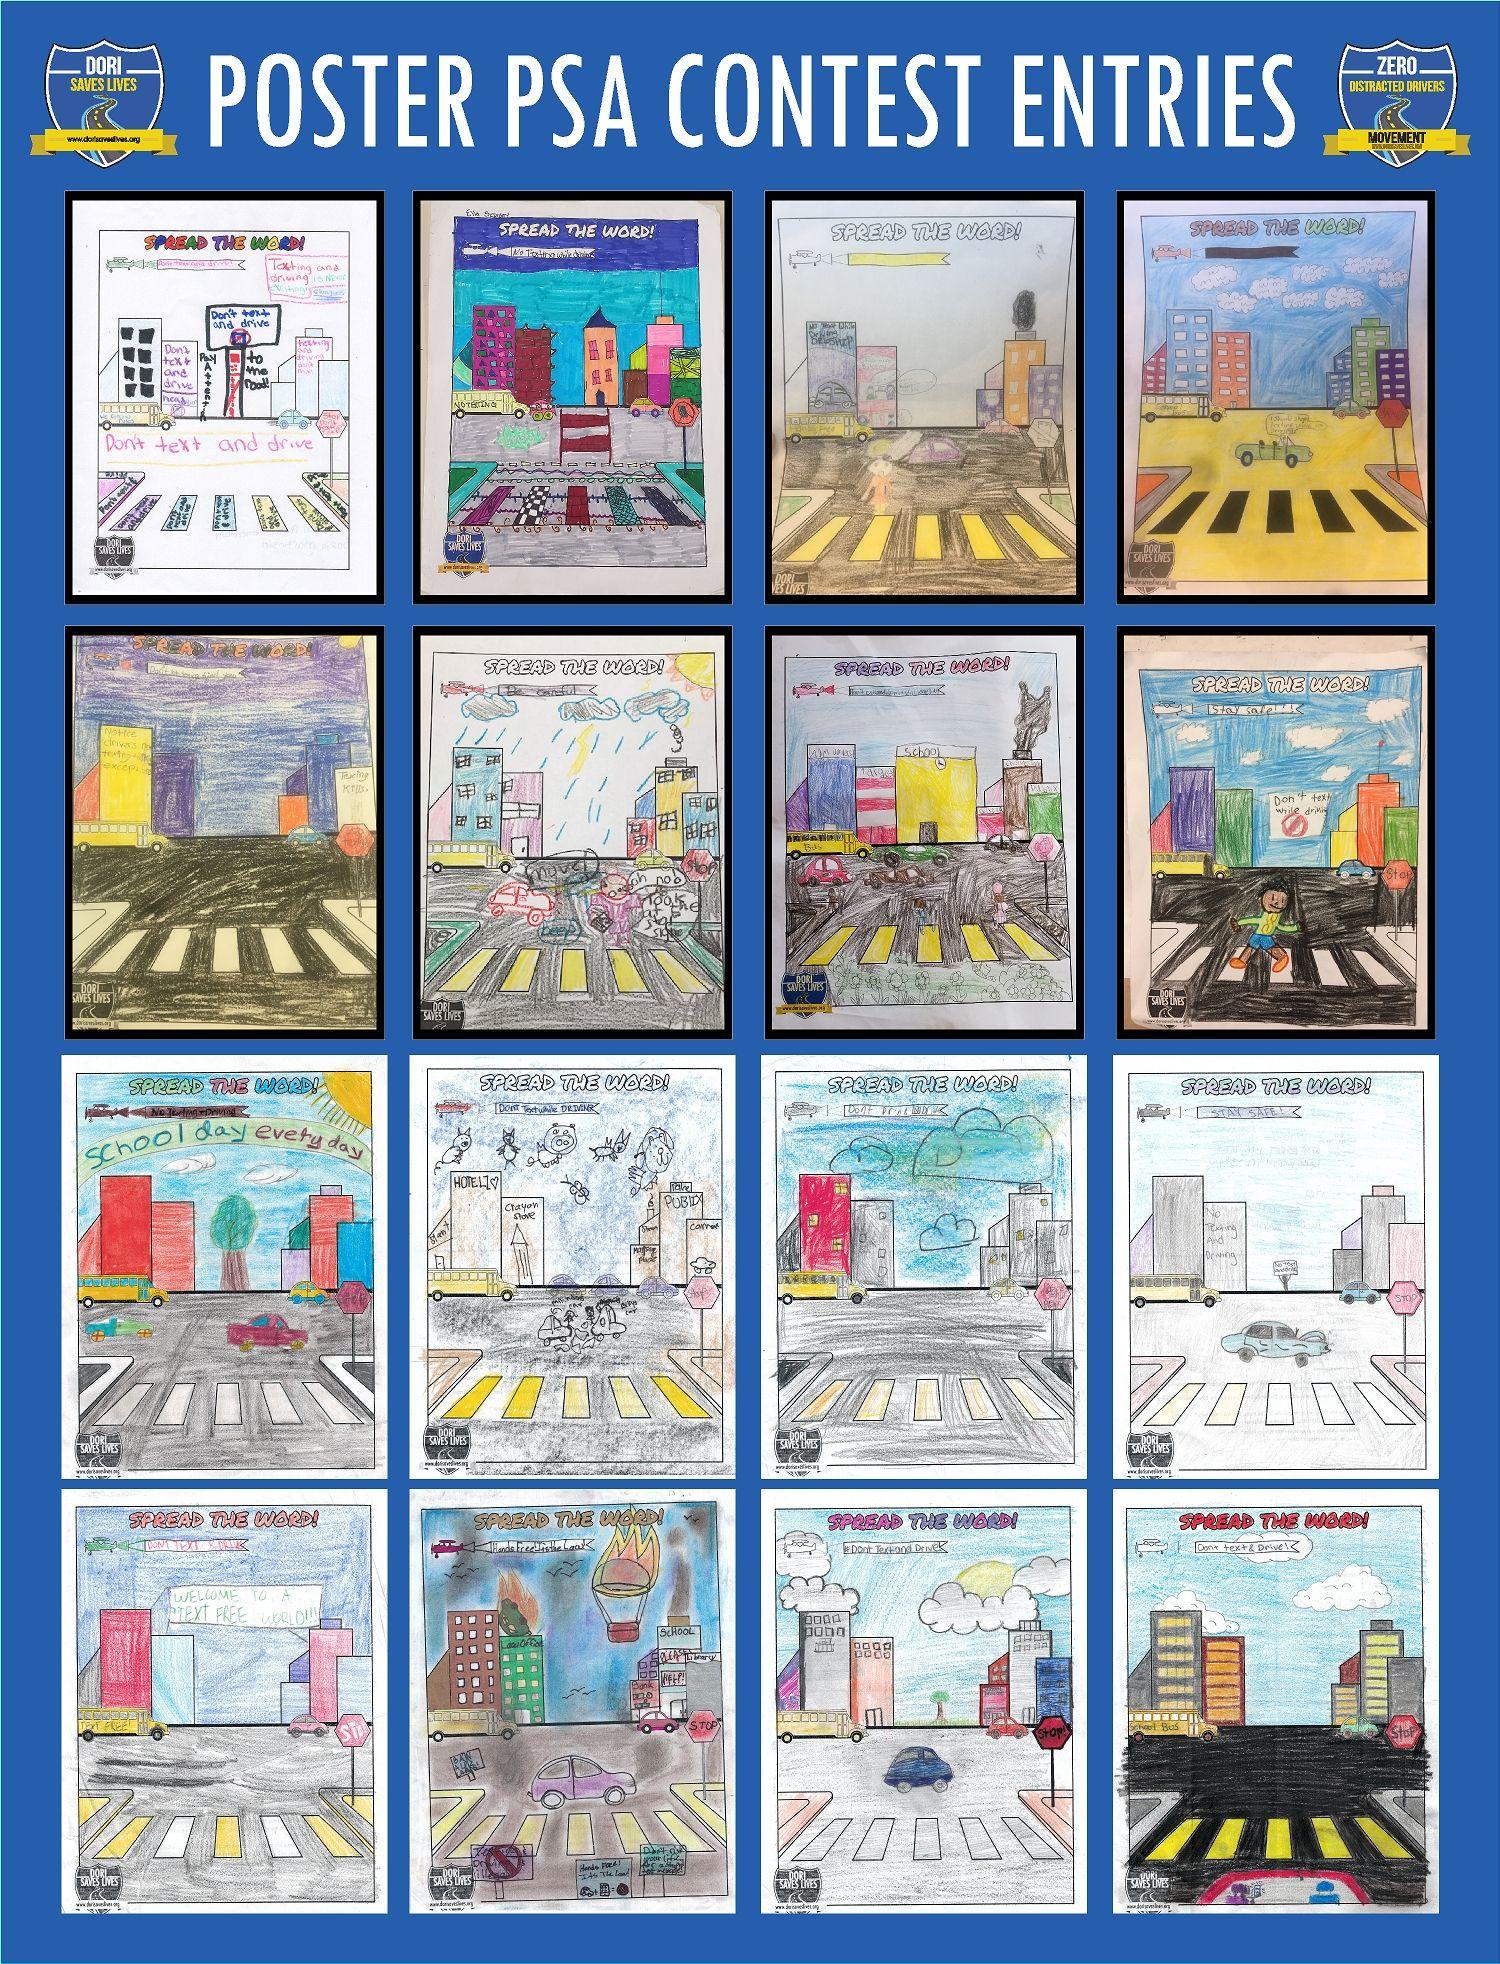 Poster PSA Entries 1-16